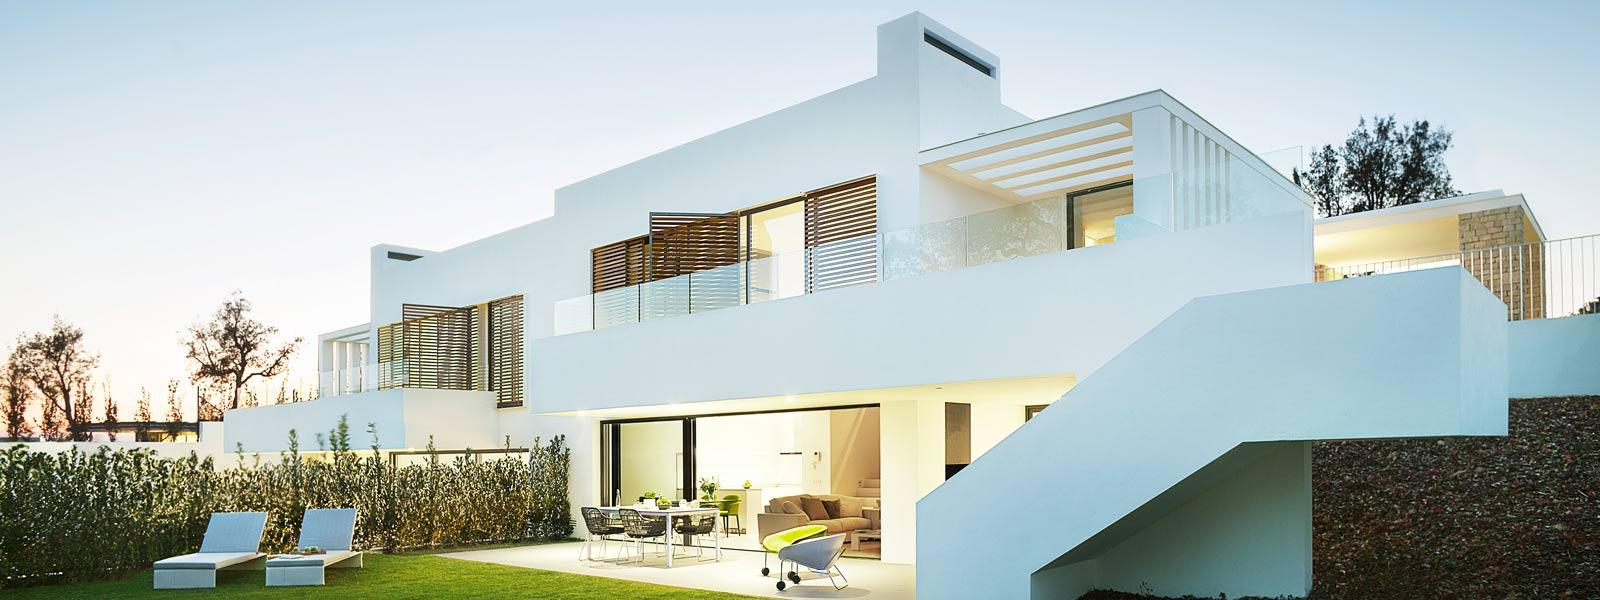 Maison Contemporaine Espagne